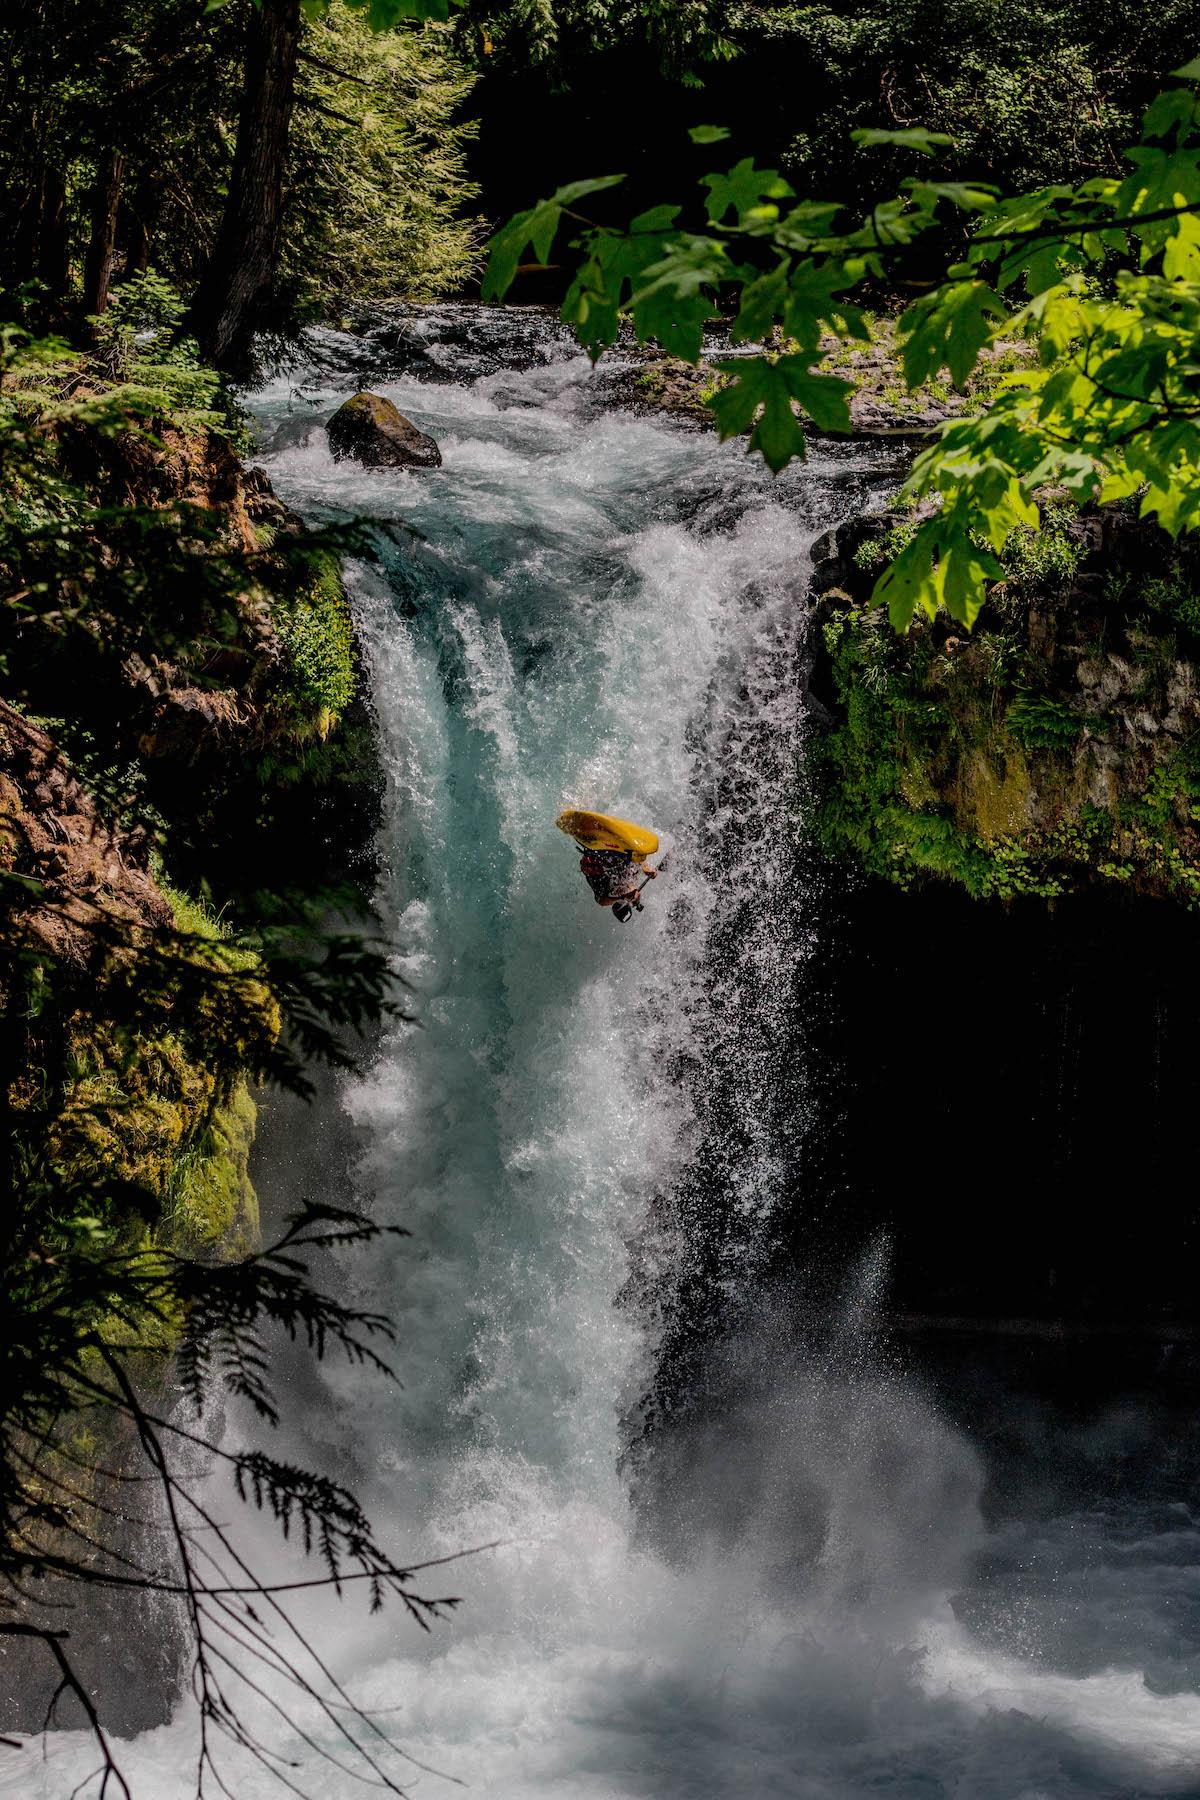 Aniol Serrasolses Kayak Orbit Flip John Haines/ Pistyll Productions